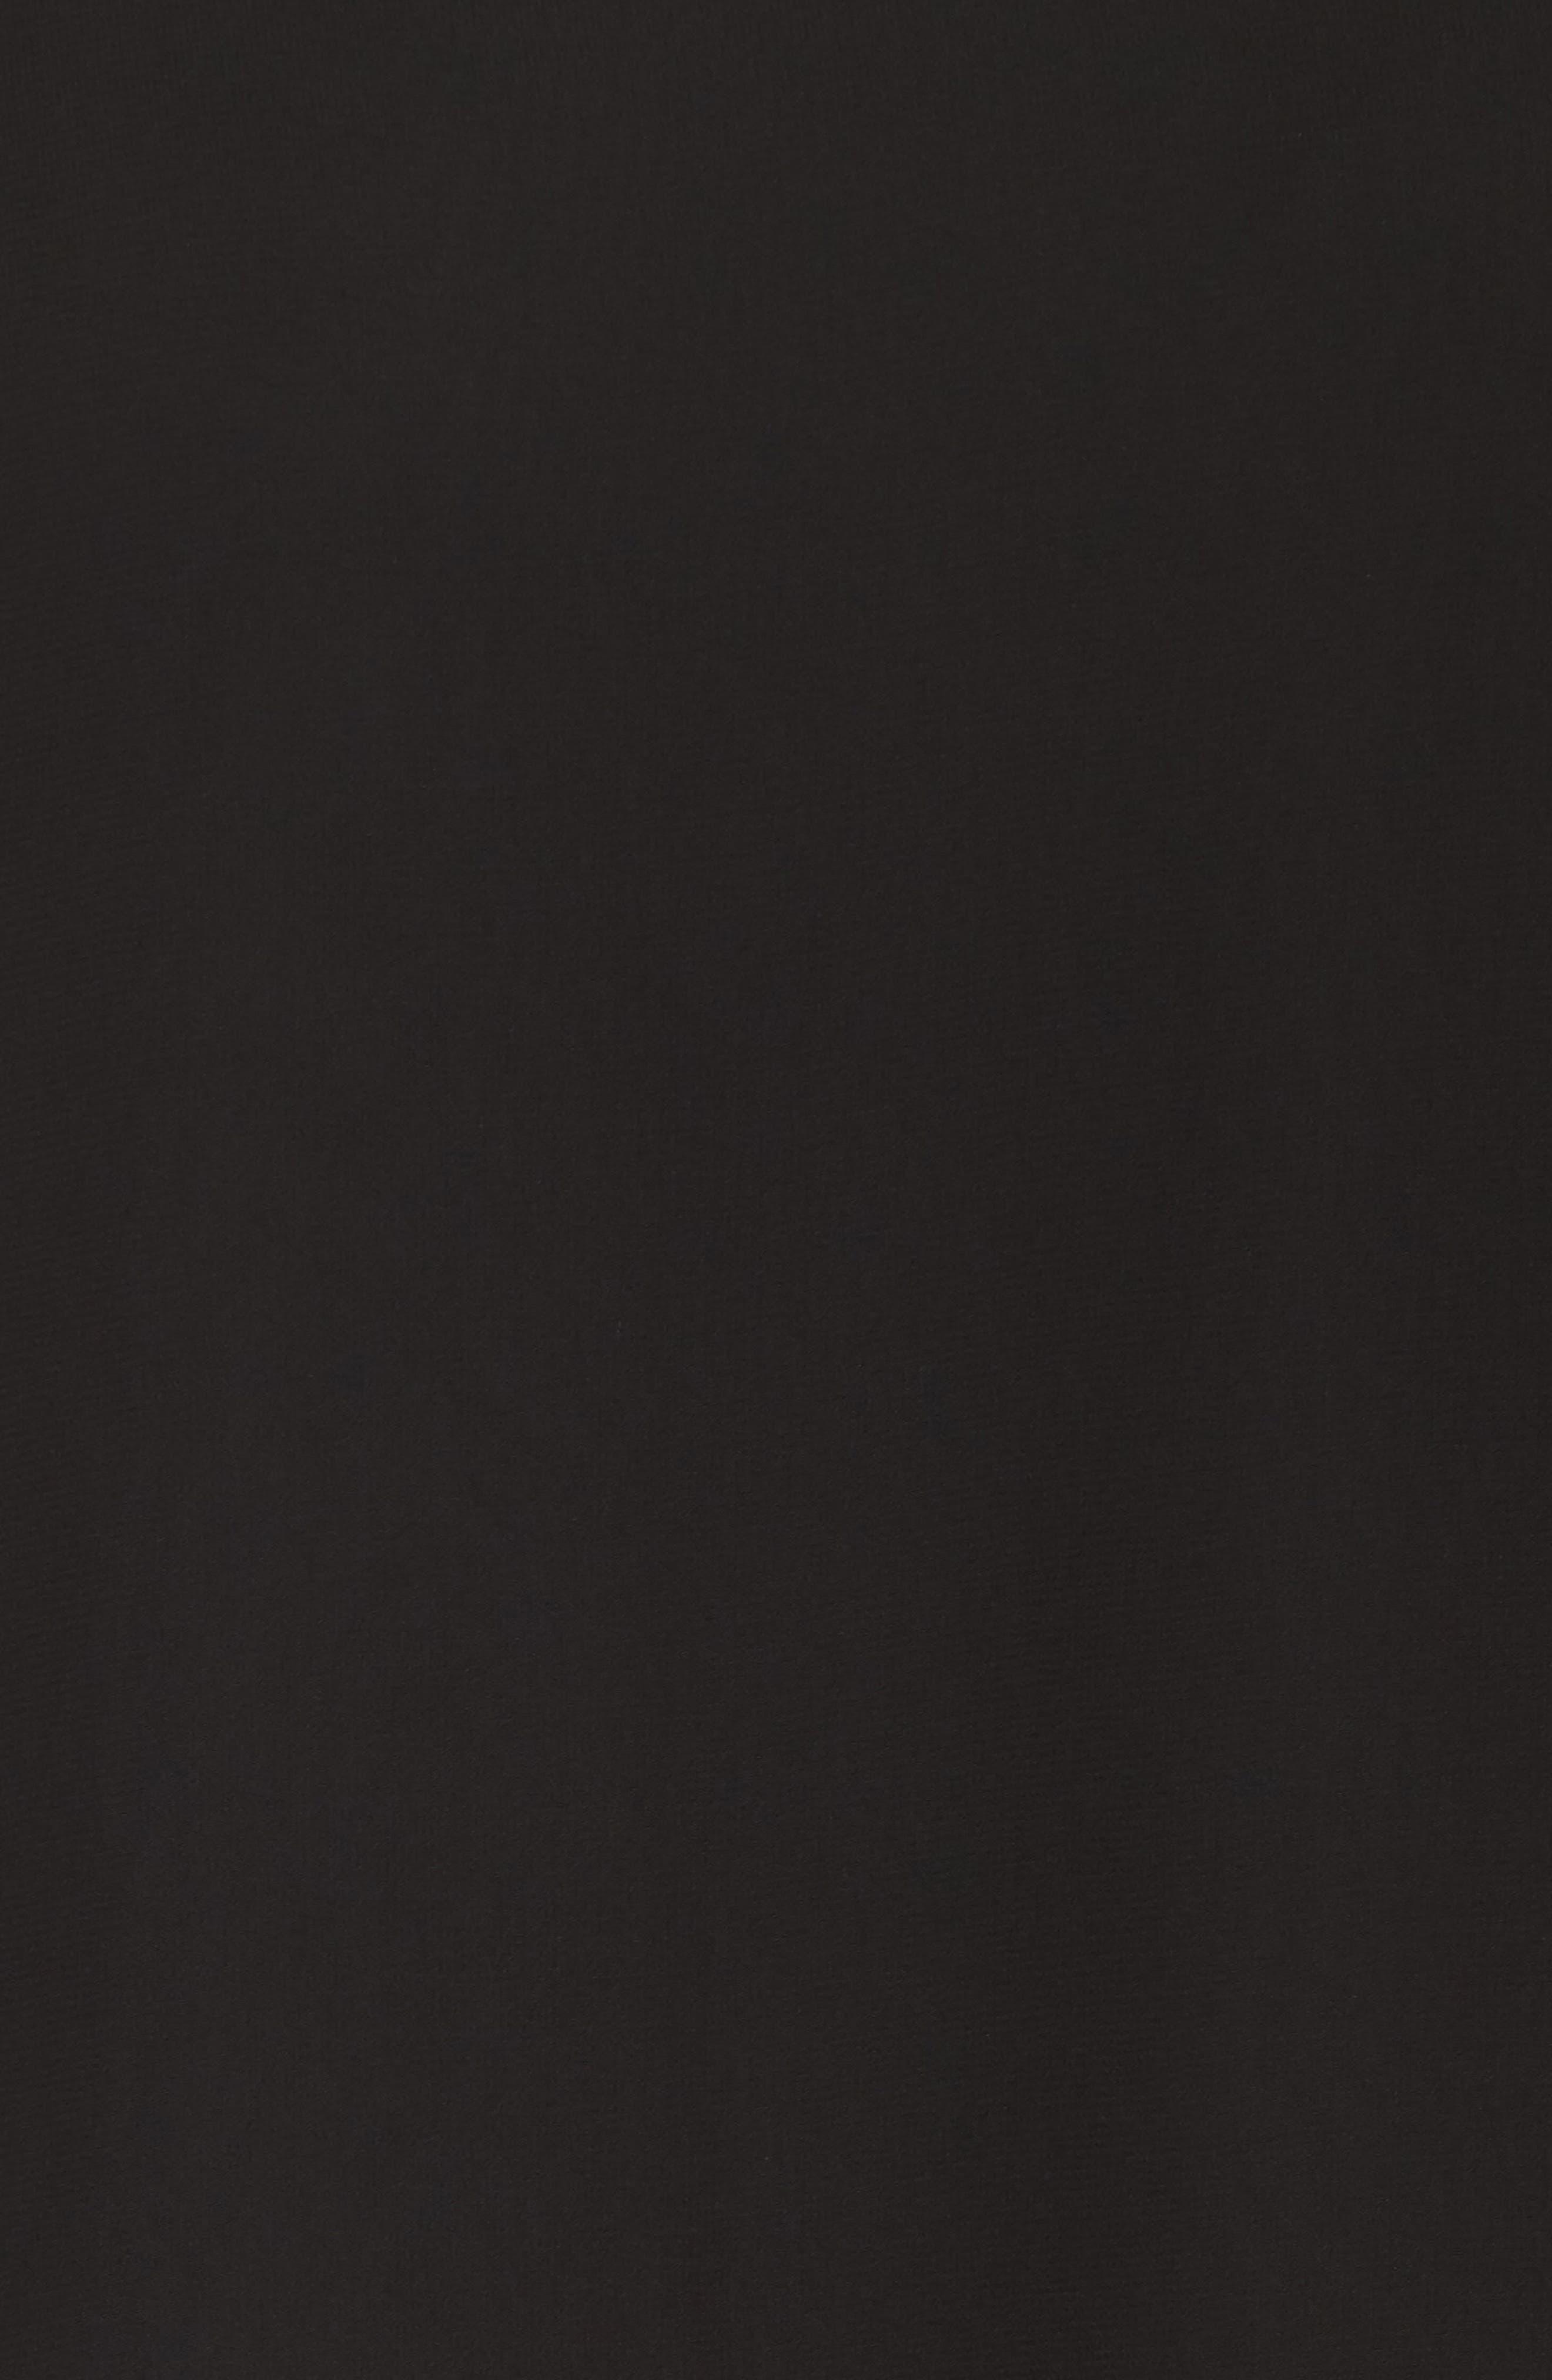 Beaded Neck Chiffon Overlay Dress,                             Alternate thumbnail 6, color,                             BLACK/ GUNMETAL